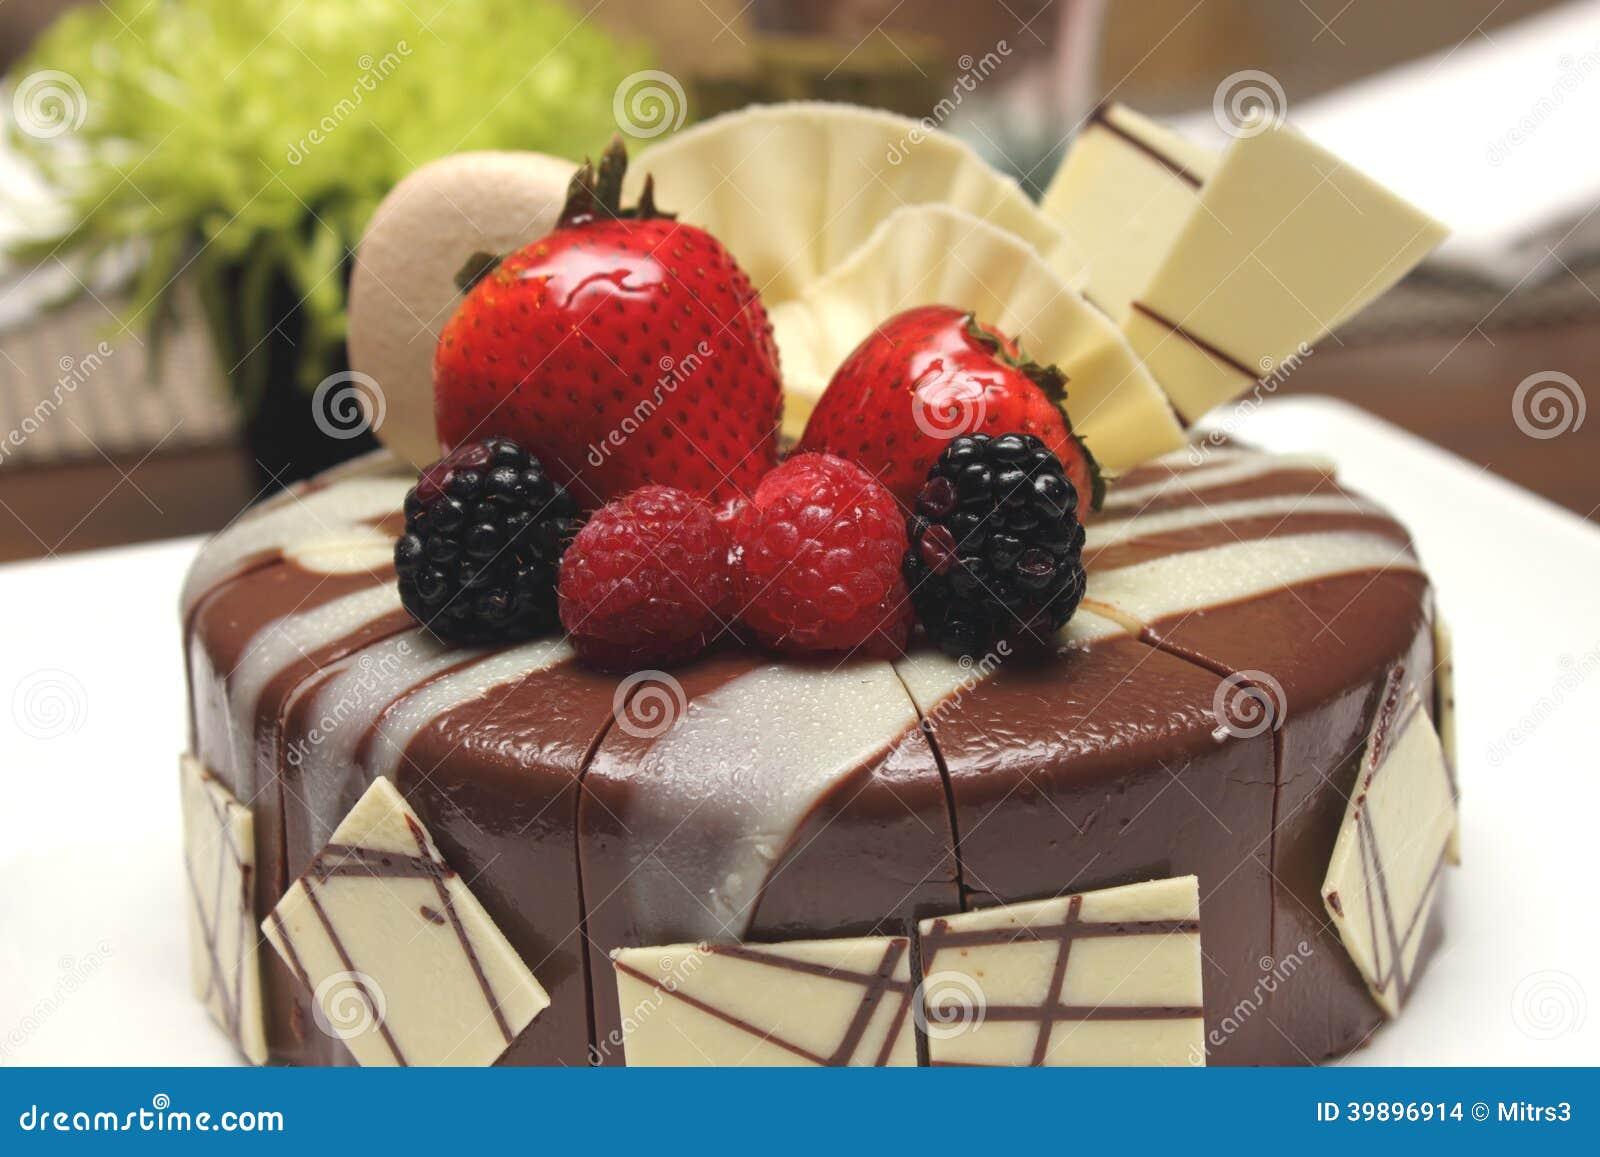 Delicious Chocolate Strawberry Cake With Chocolate Ganache. Stock ...